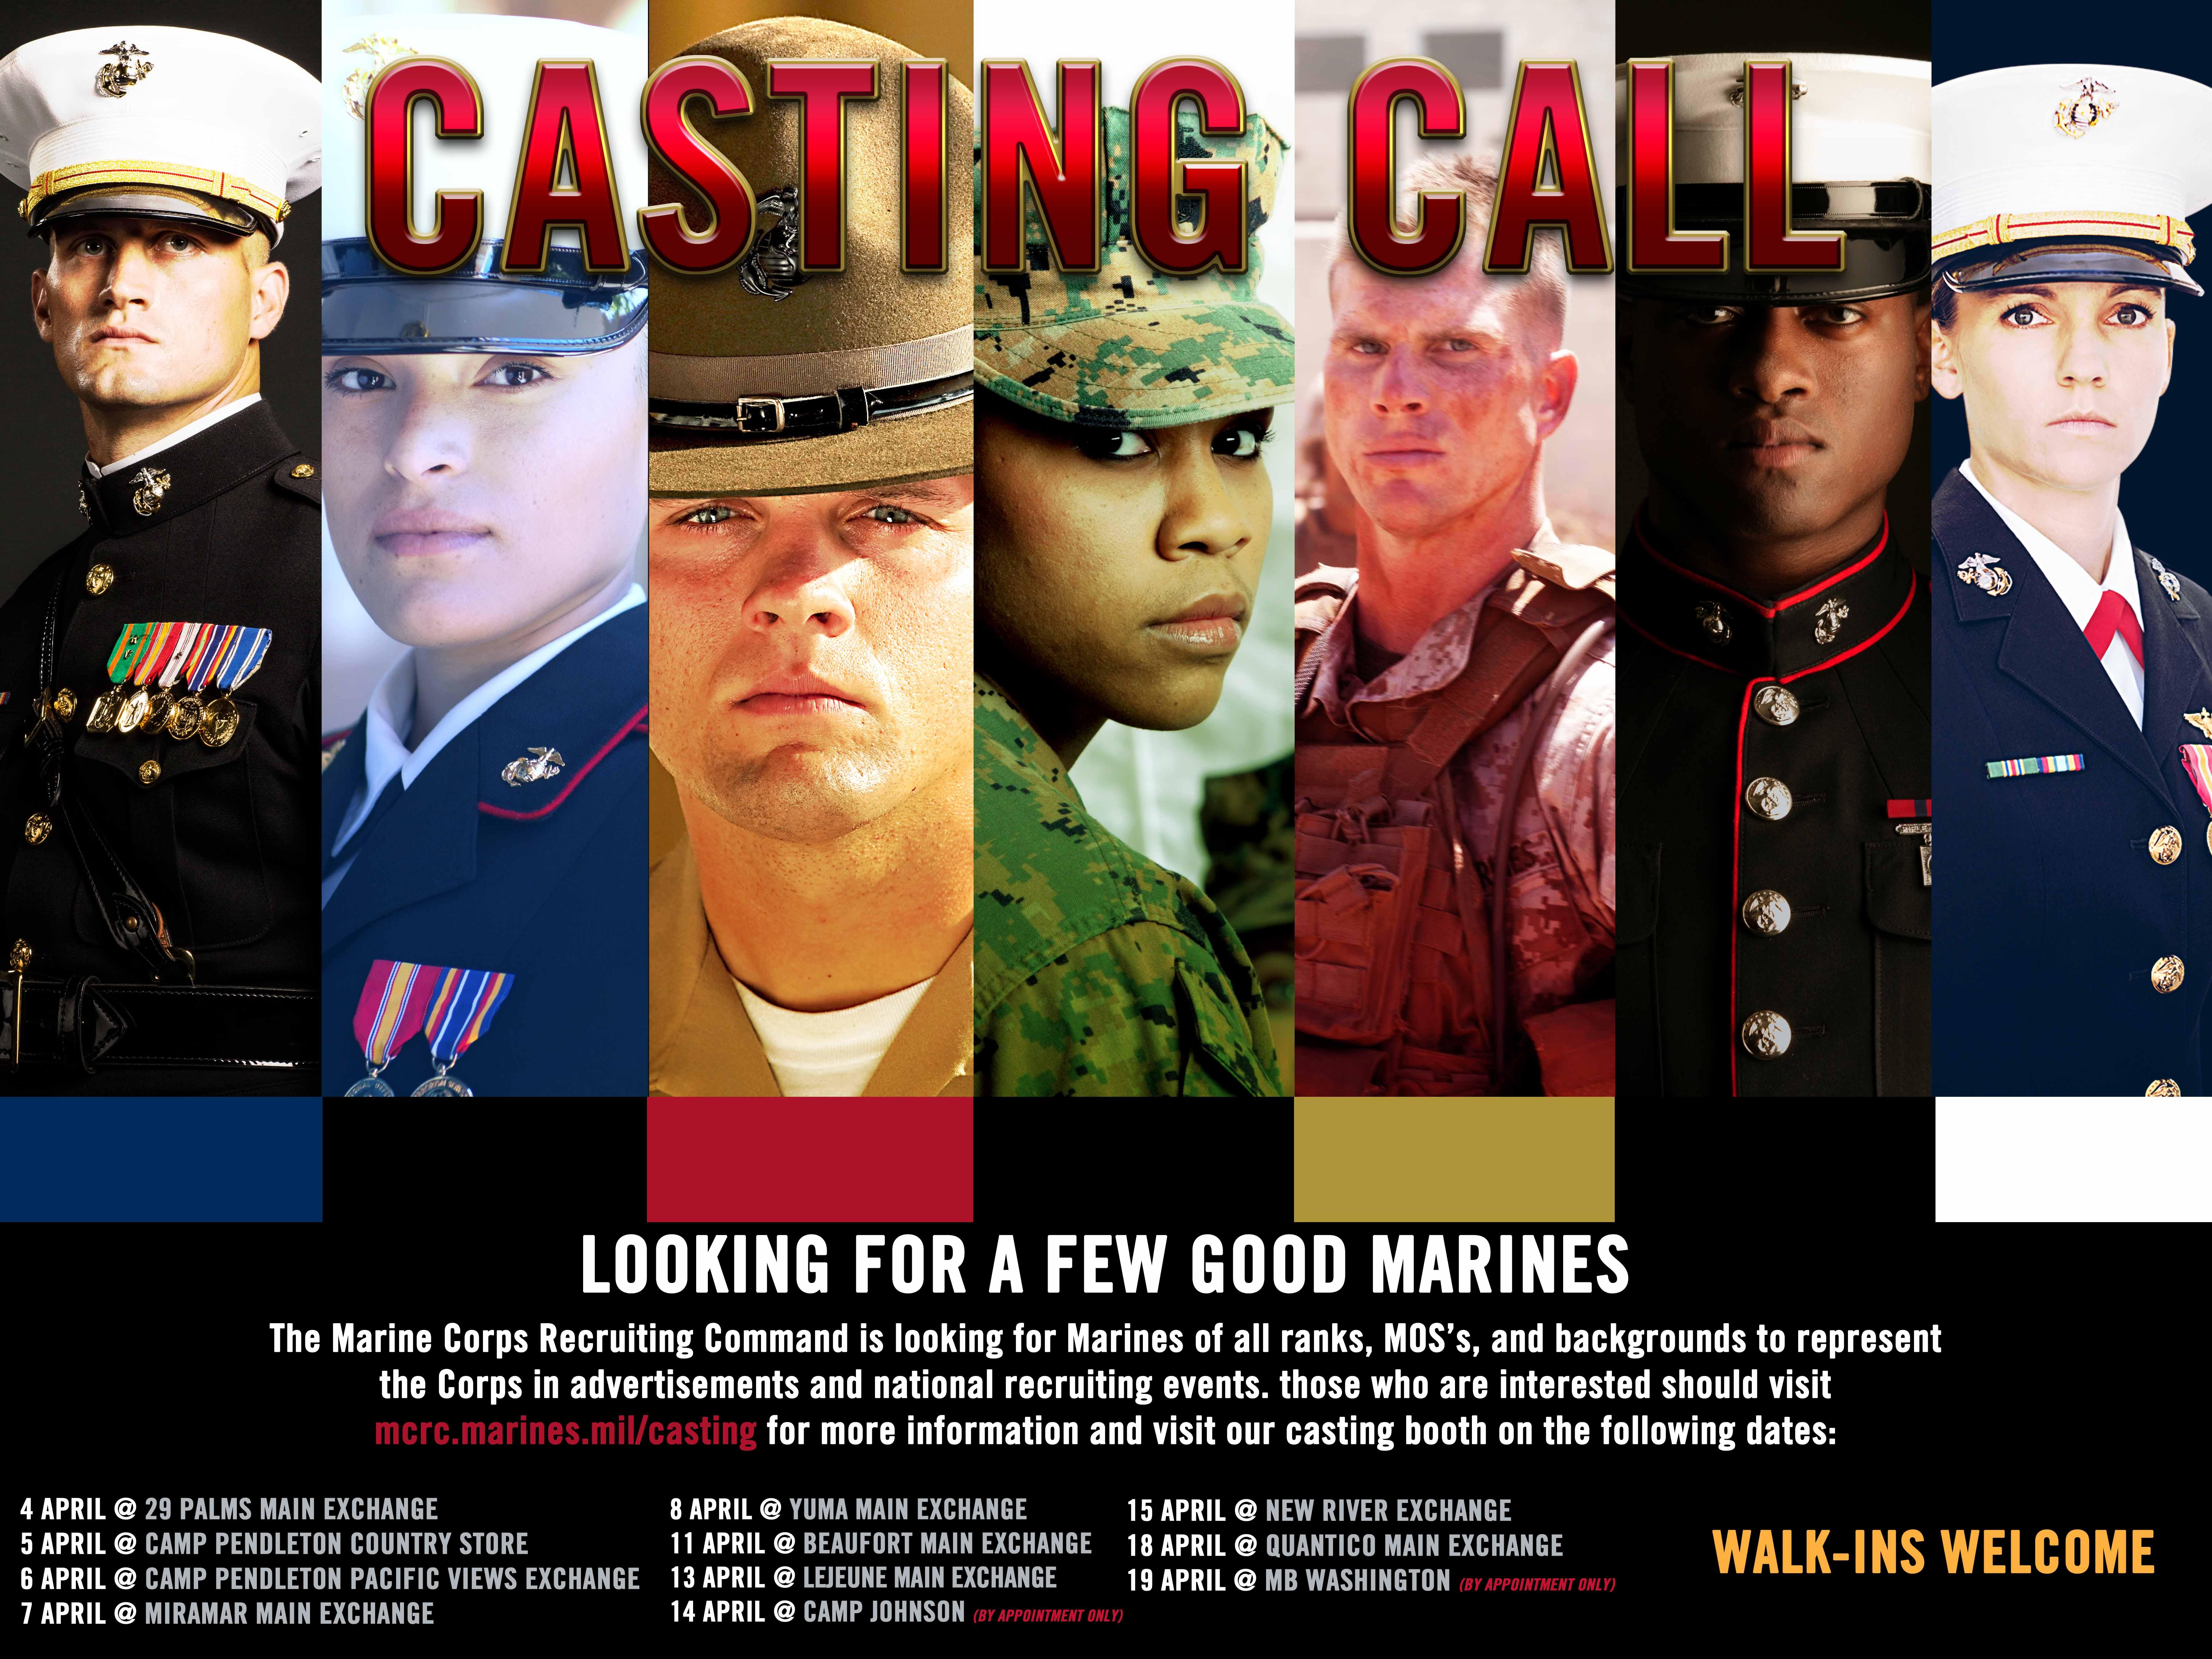 marine corps recruiting command  u0026gt  casting